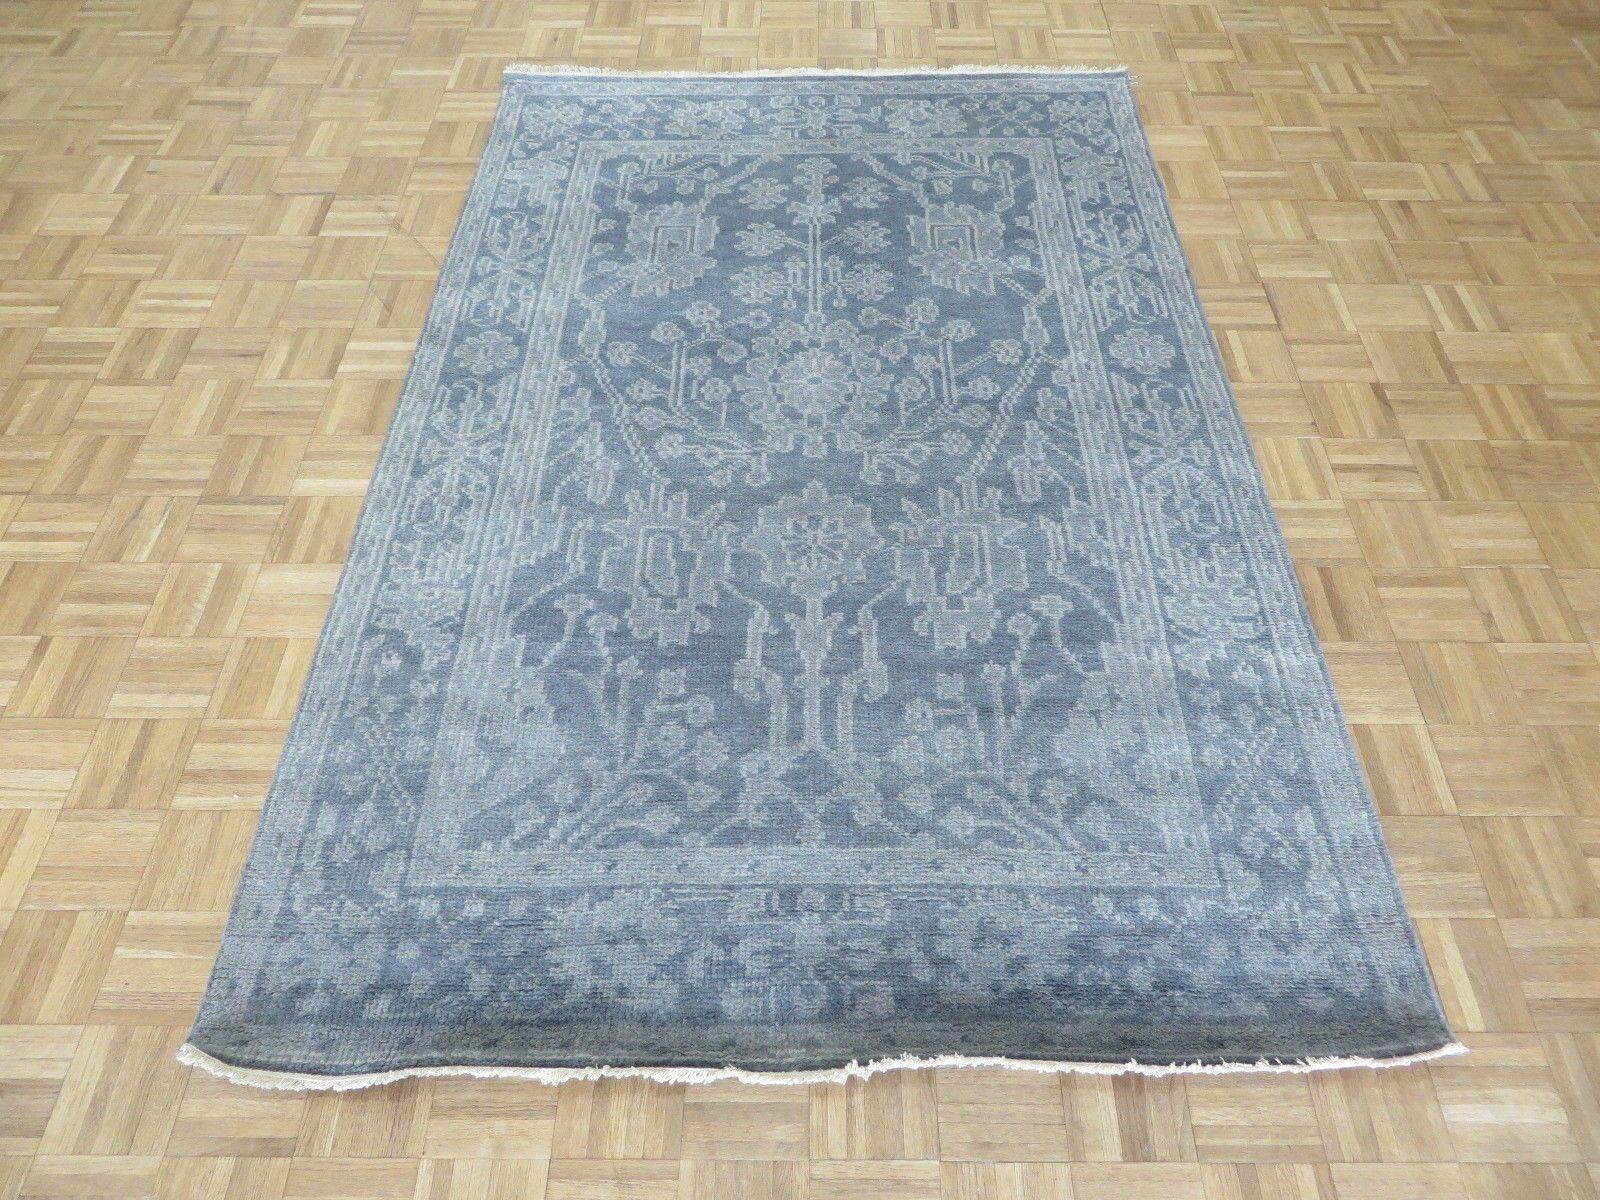 One-of-a-Kind Sherika Oushak Ushak Hand-Knotted Wool Silver/Blue Area Rug